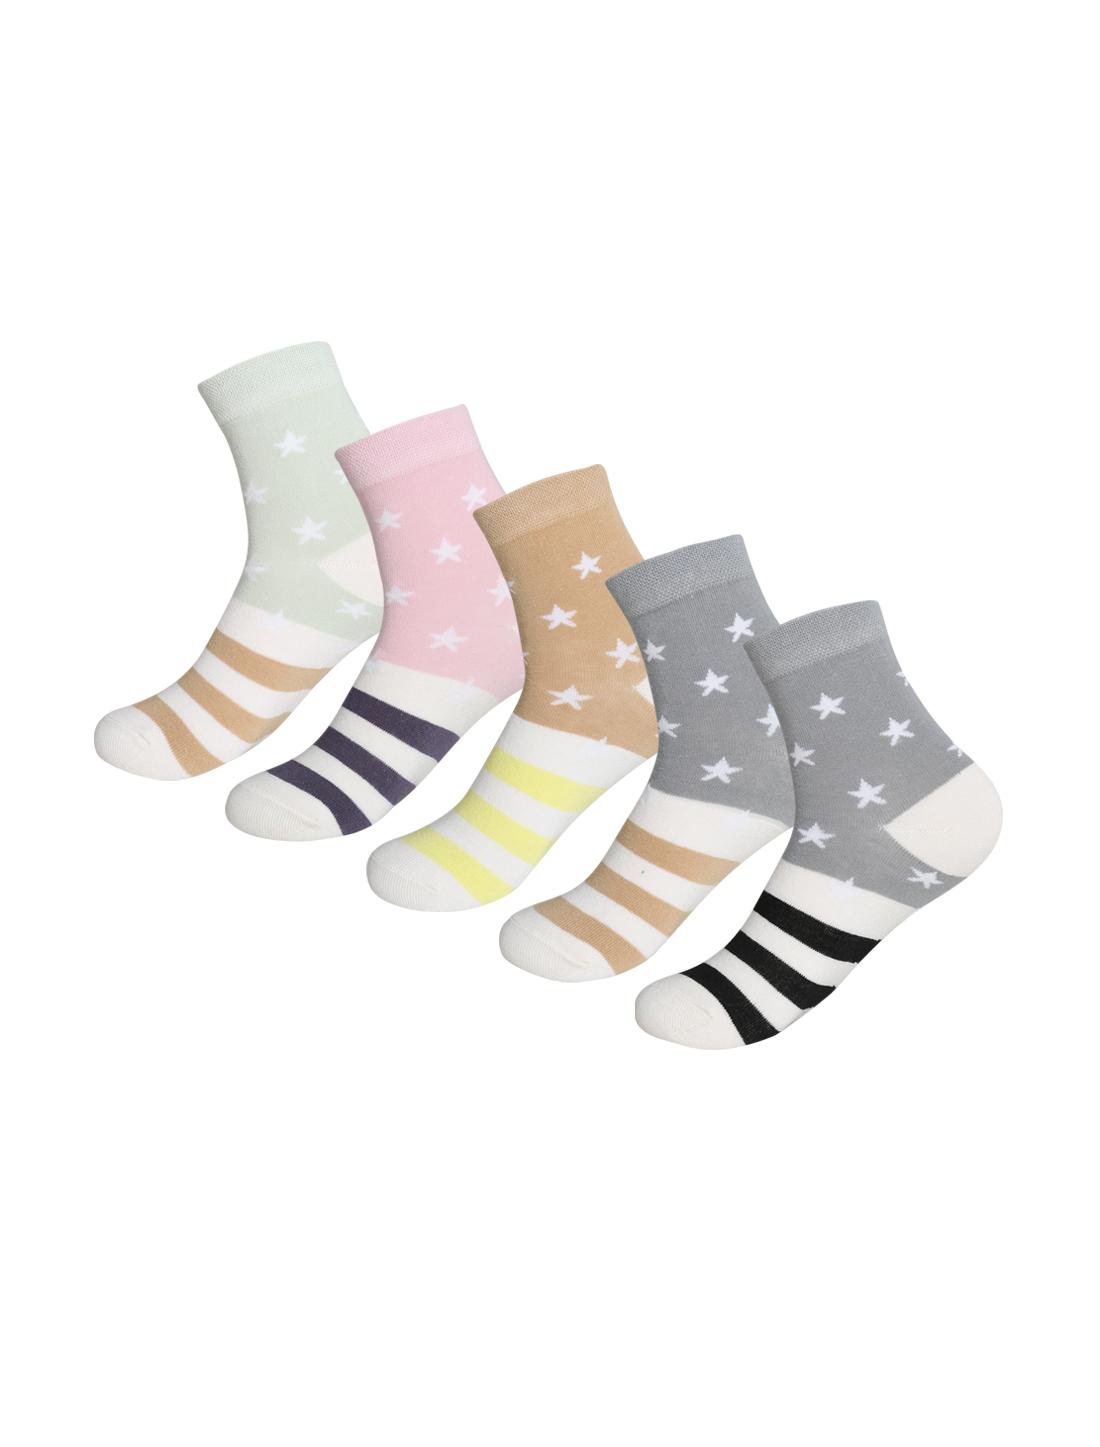 Women 5 Pack Cotton Blend Stripes Stars Crew Socks Assorted 9-11